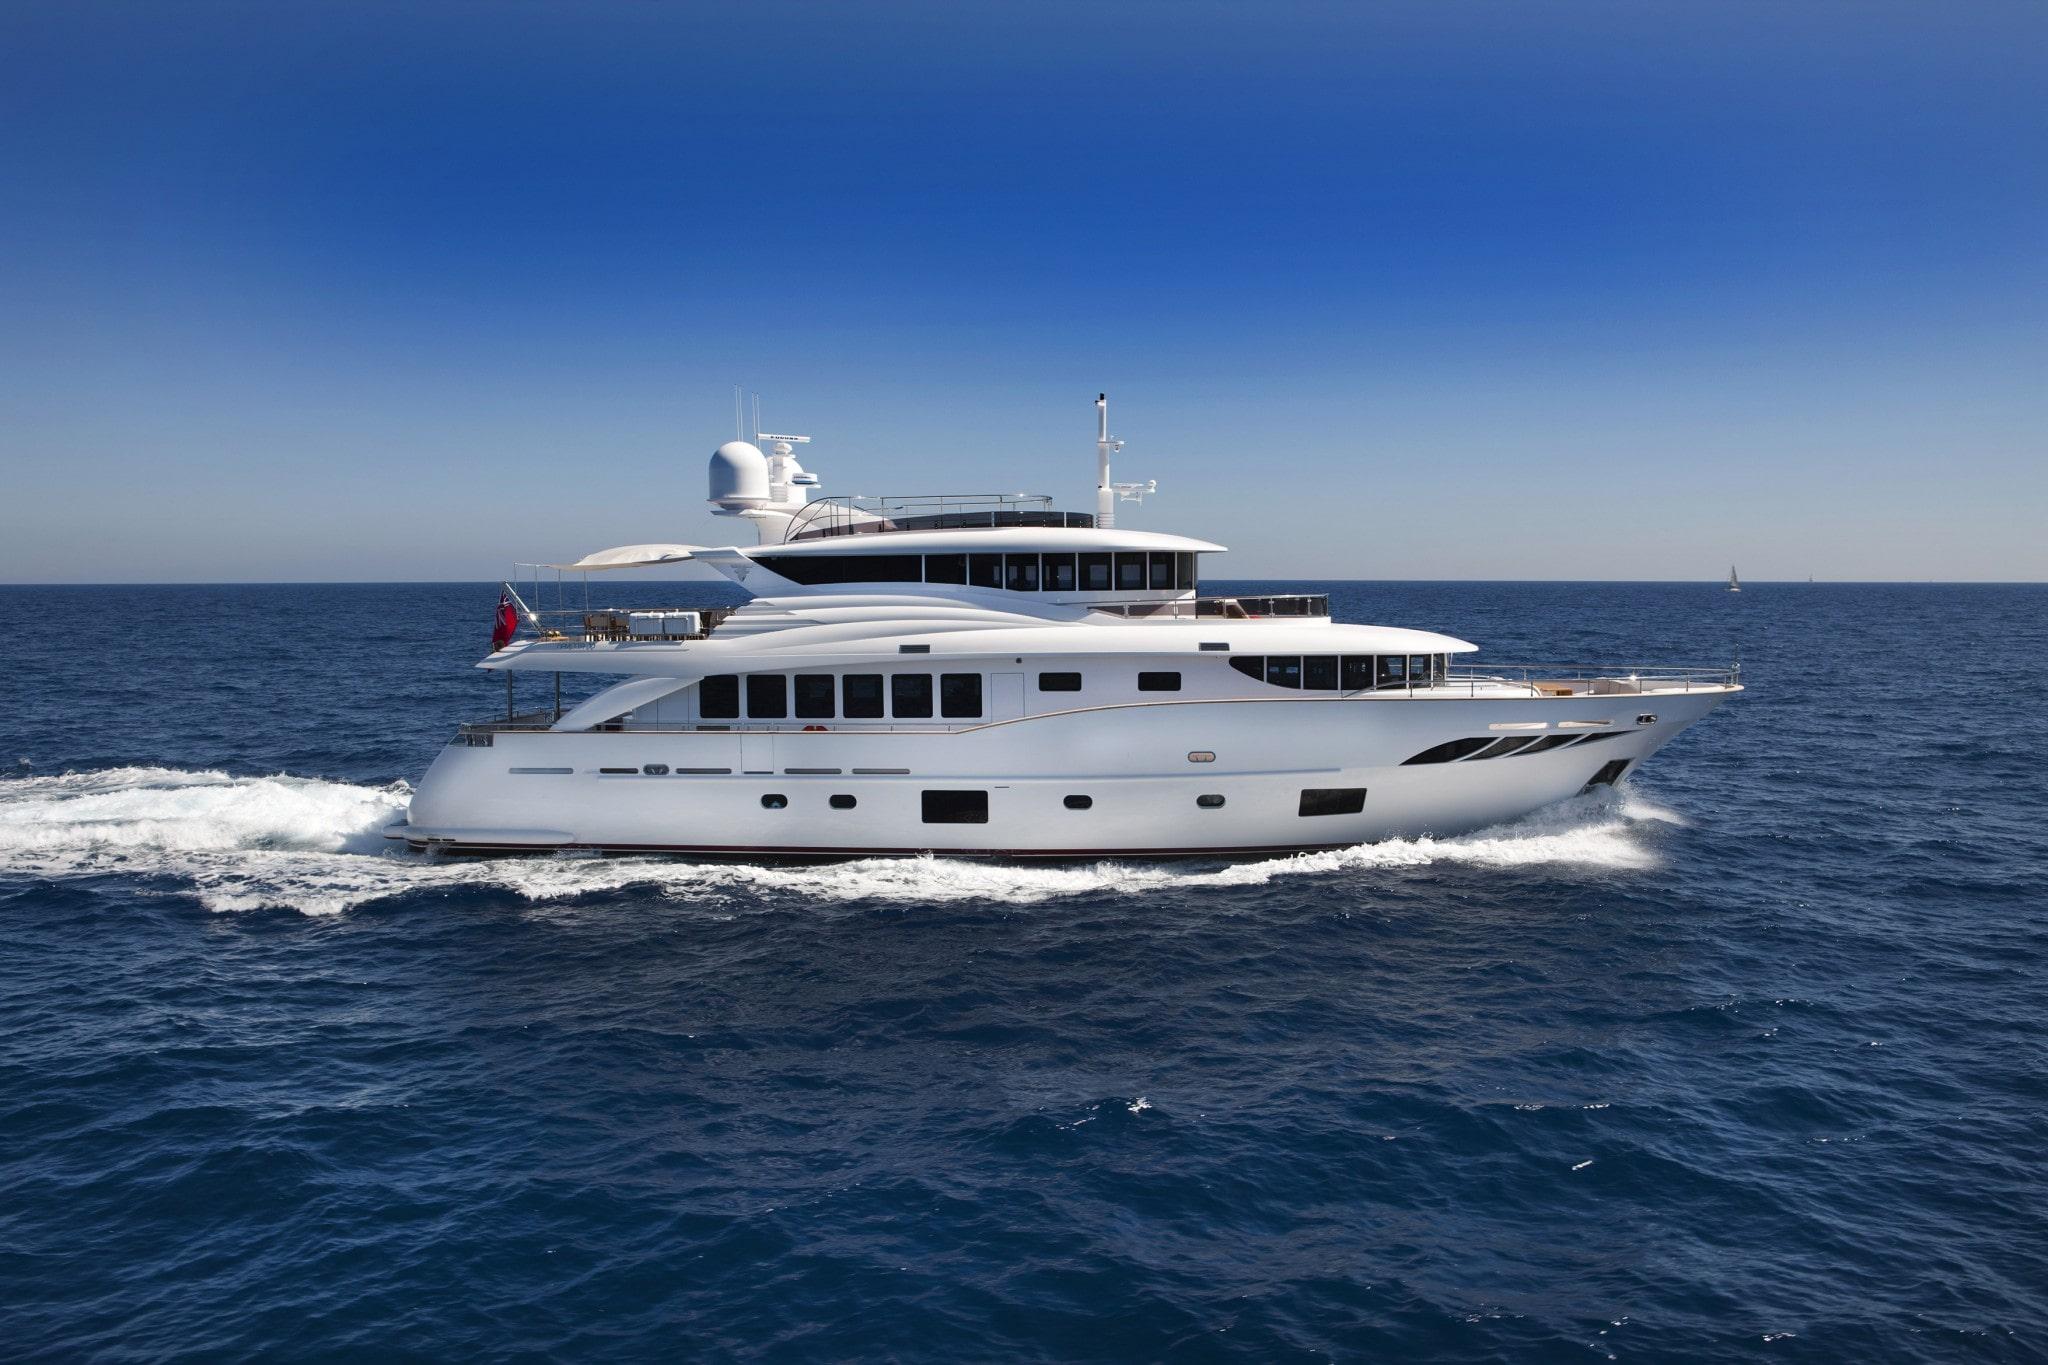 Luxury Yacht Navetta Displacement 30 meters